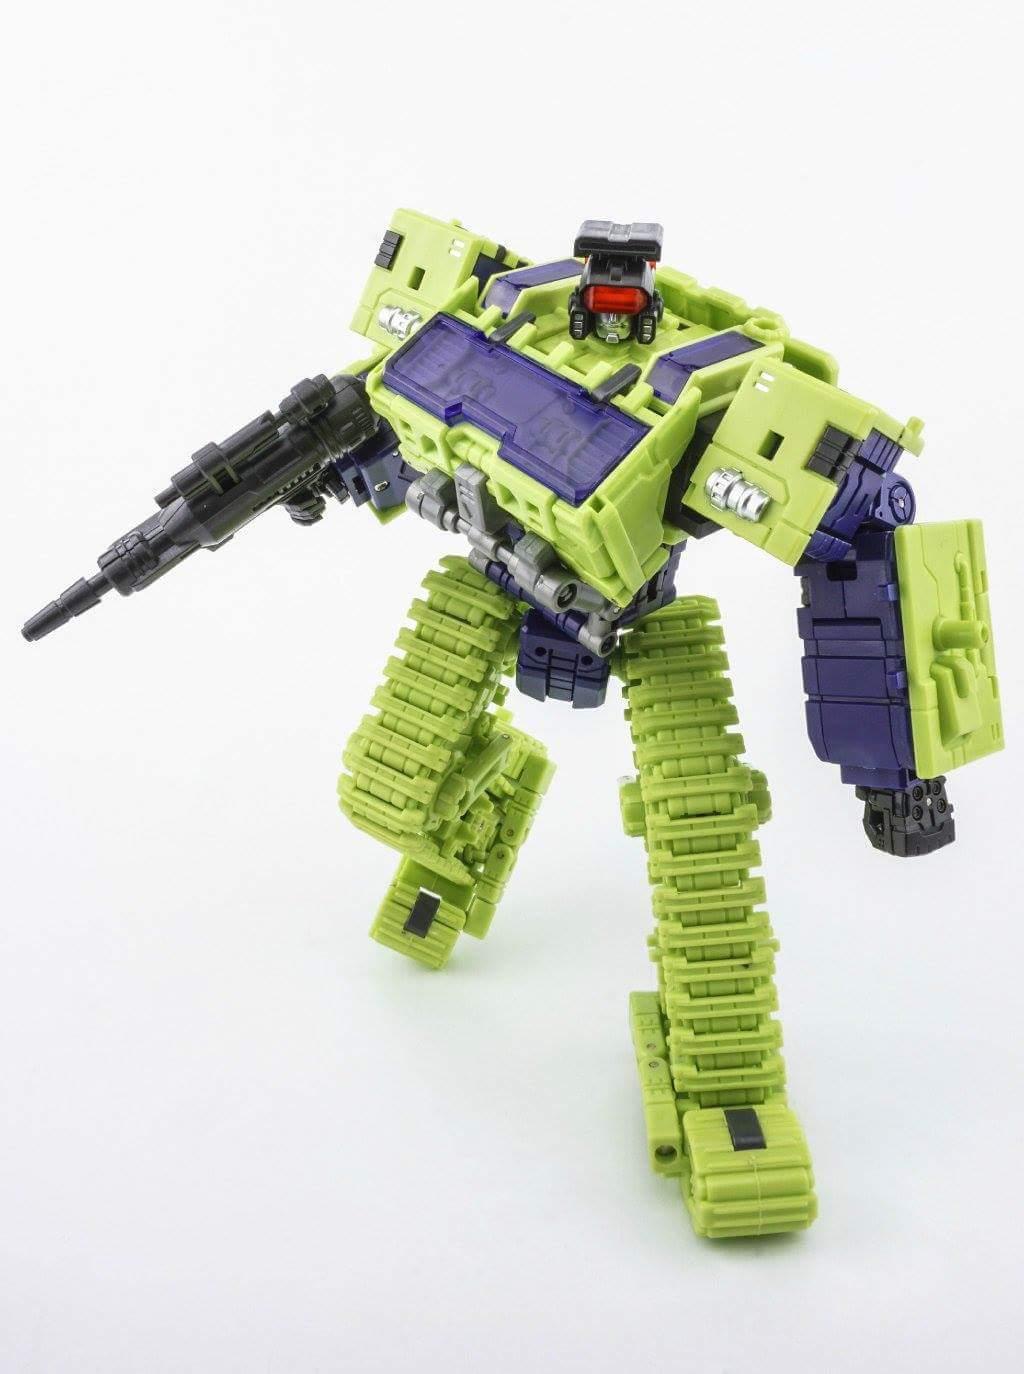 [Toyworld] Produit Tiers - Jouet TW-C Constructor aka Devastator/Dévastateur (Version vert G1 et jaune G2) - Page 3 5XAW44Vw